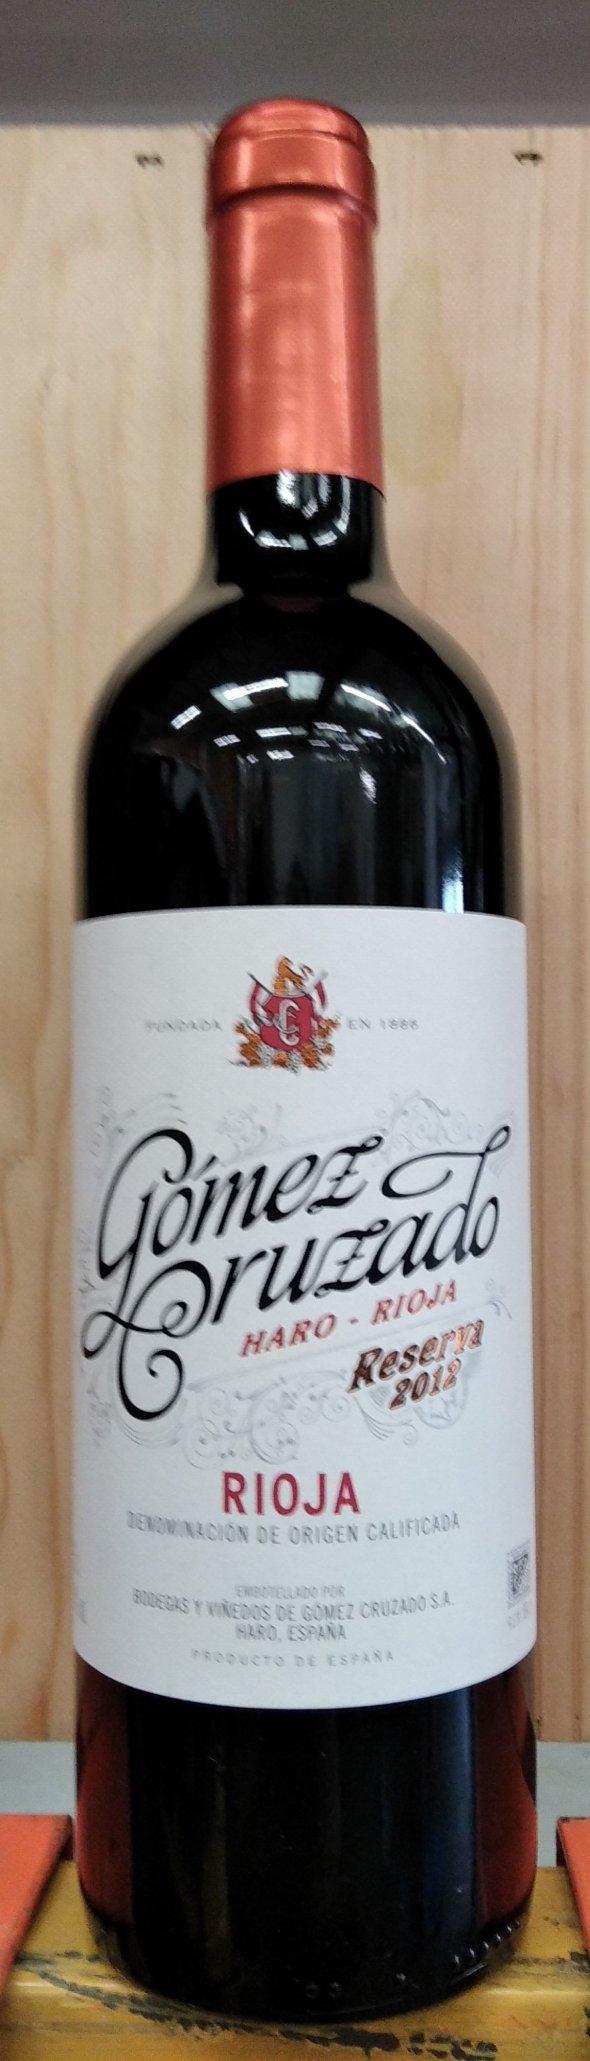 Rioja Reserva, Gómez Cruzado